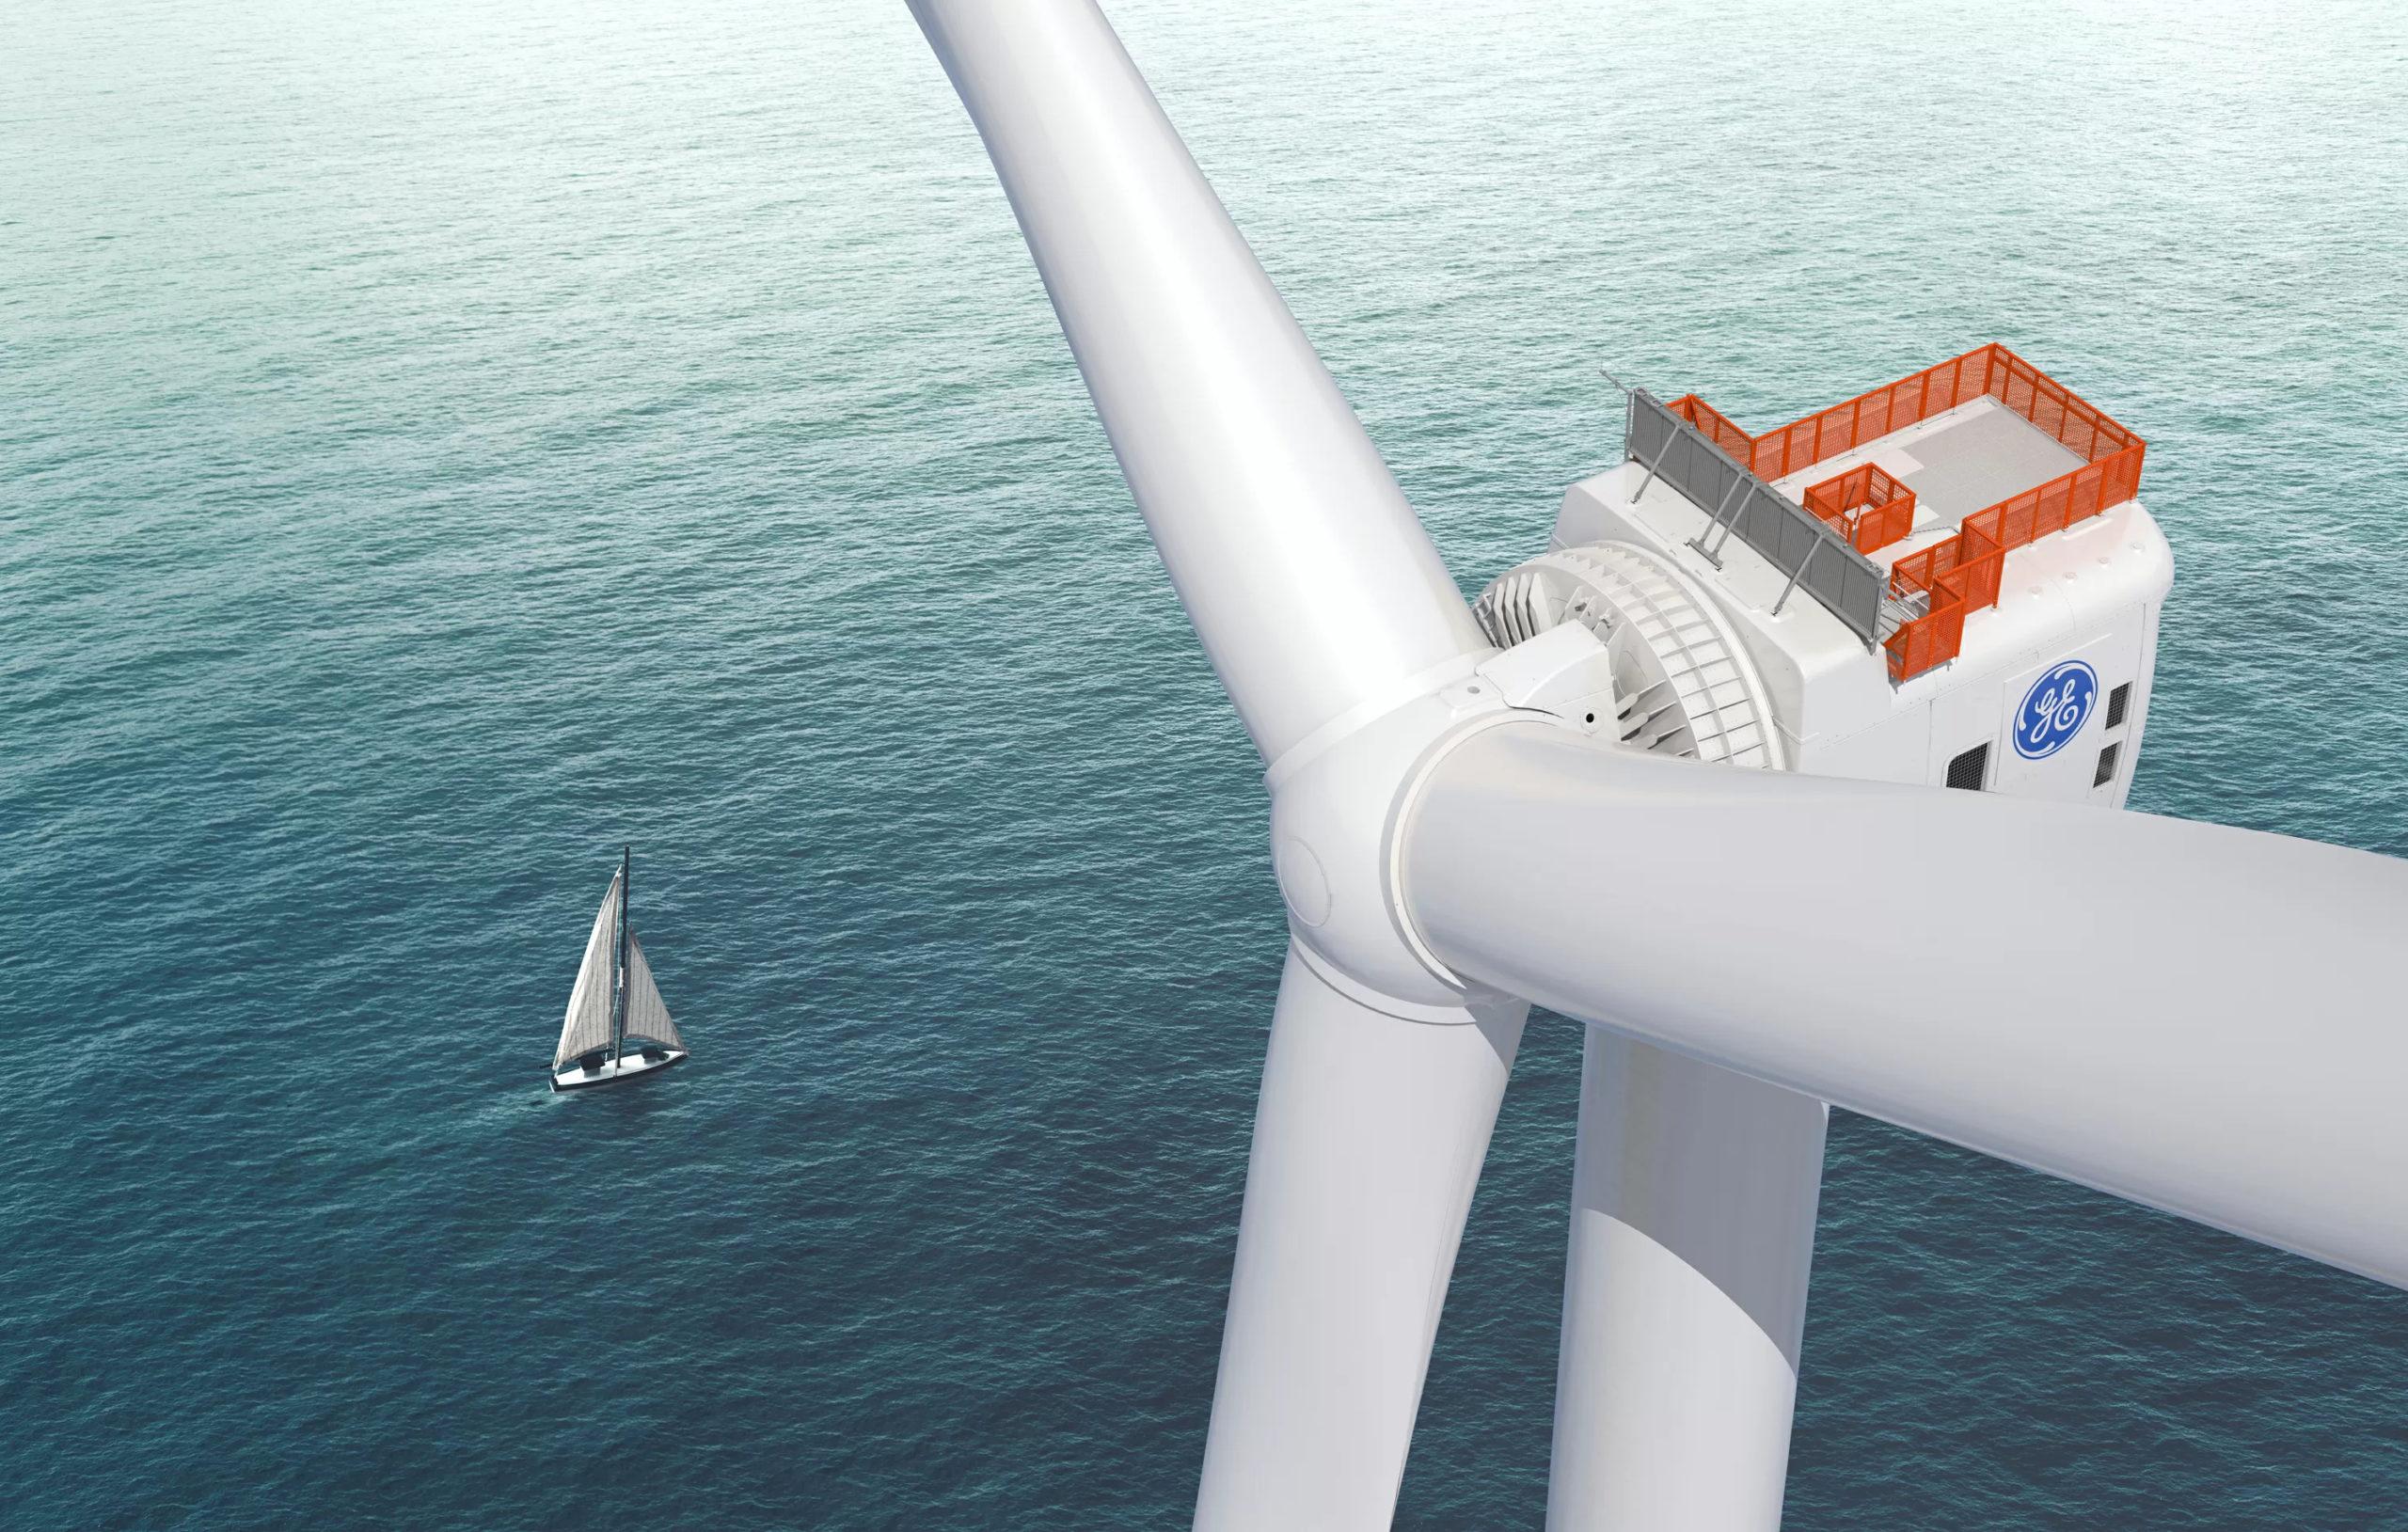 GE offshore wind turbine